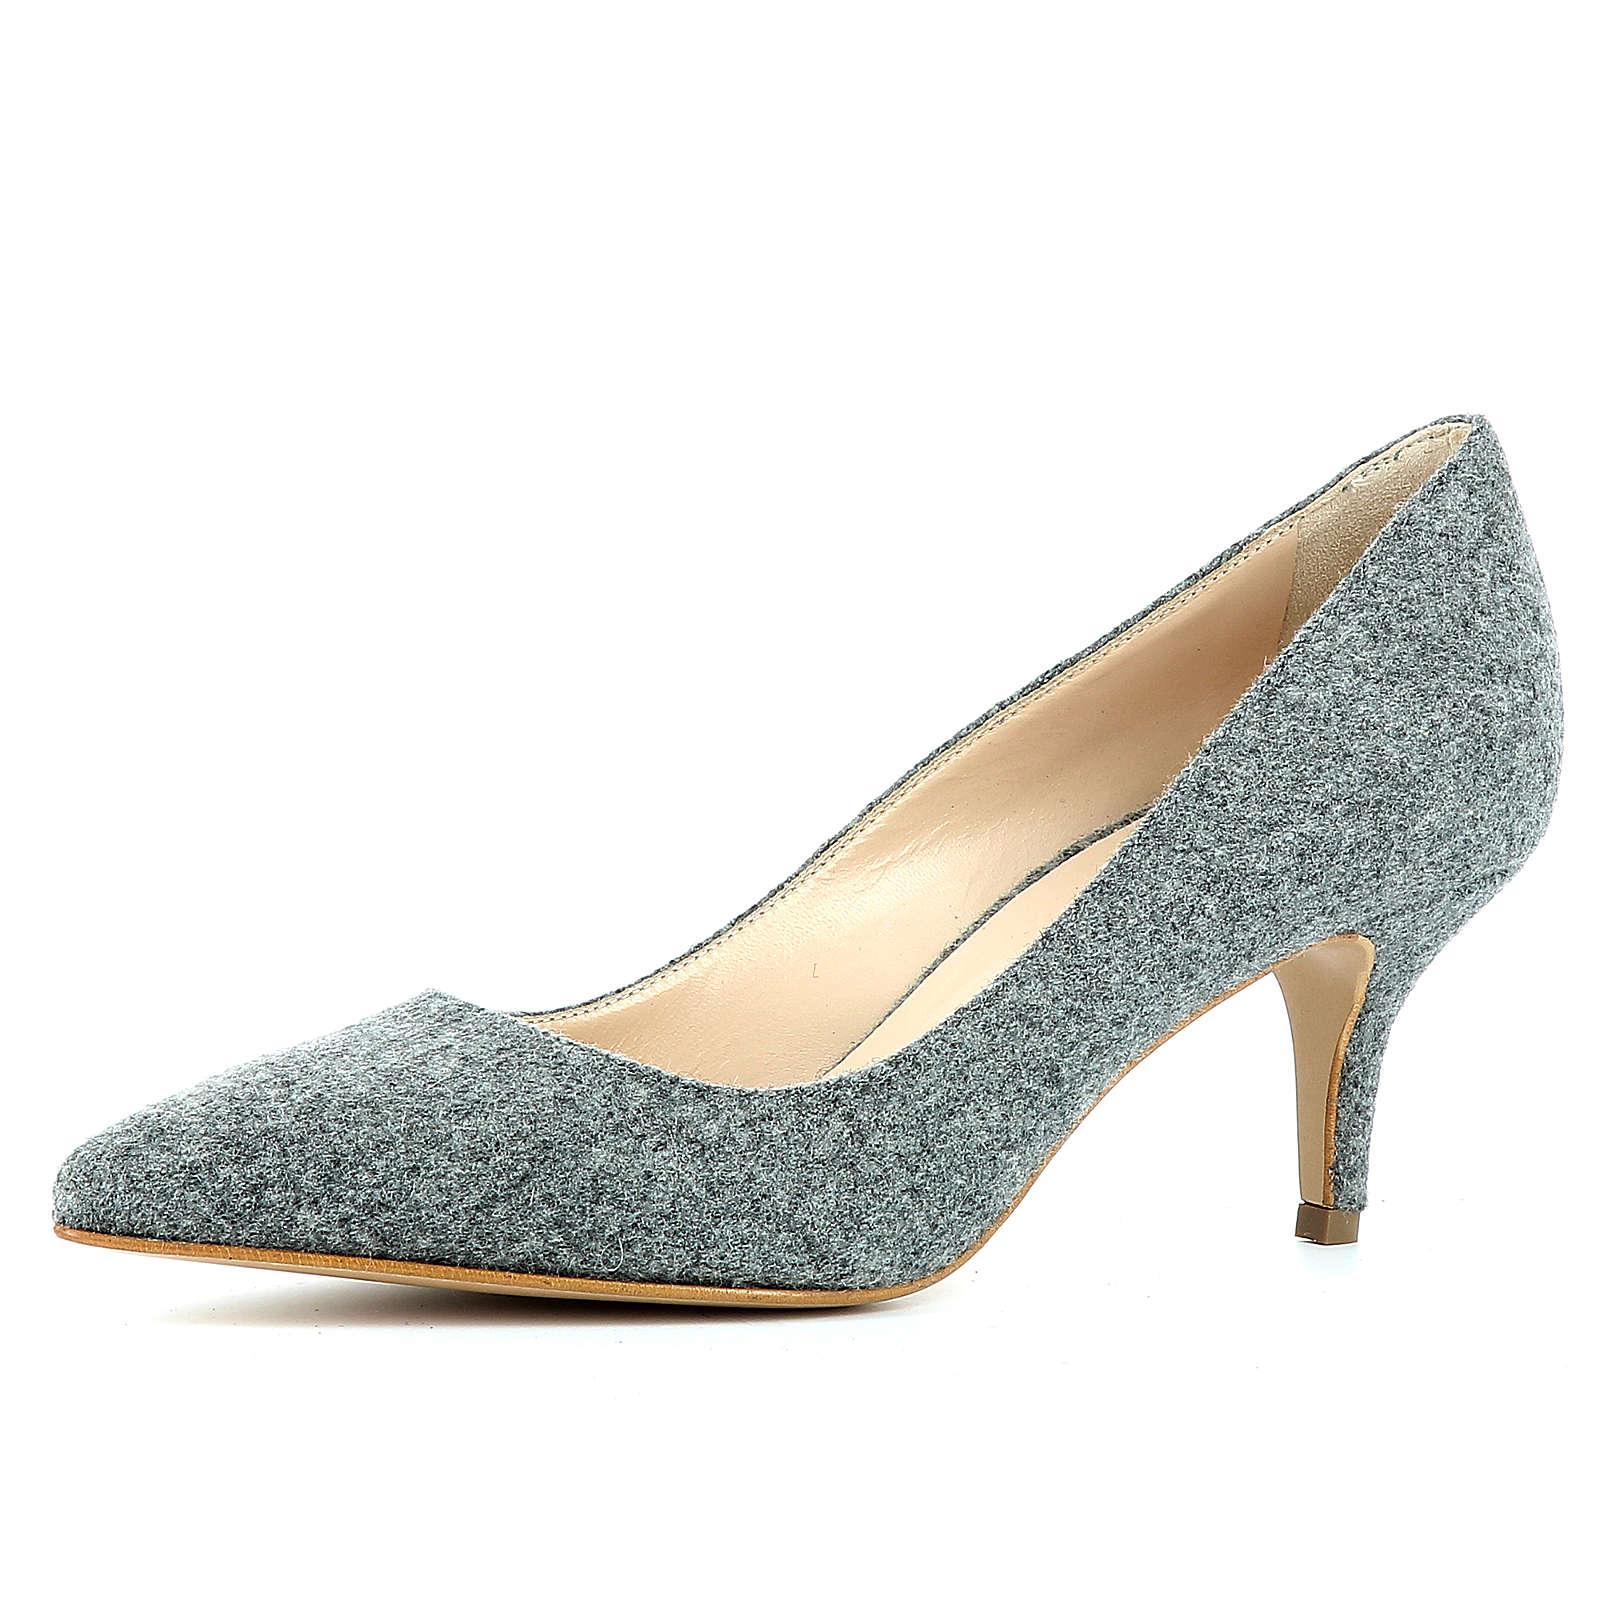 Evita Shoes Pumps grau Damen Gr. 35